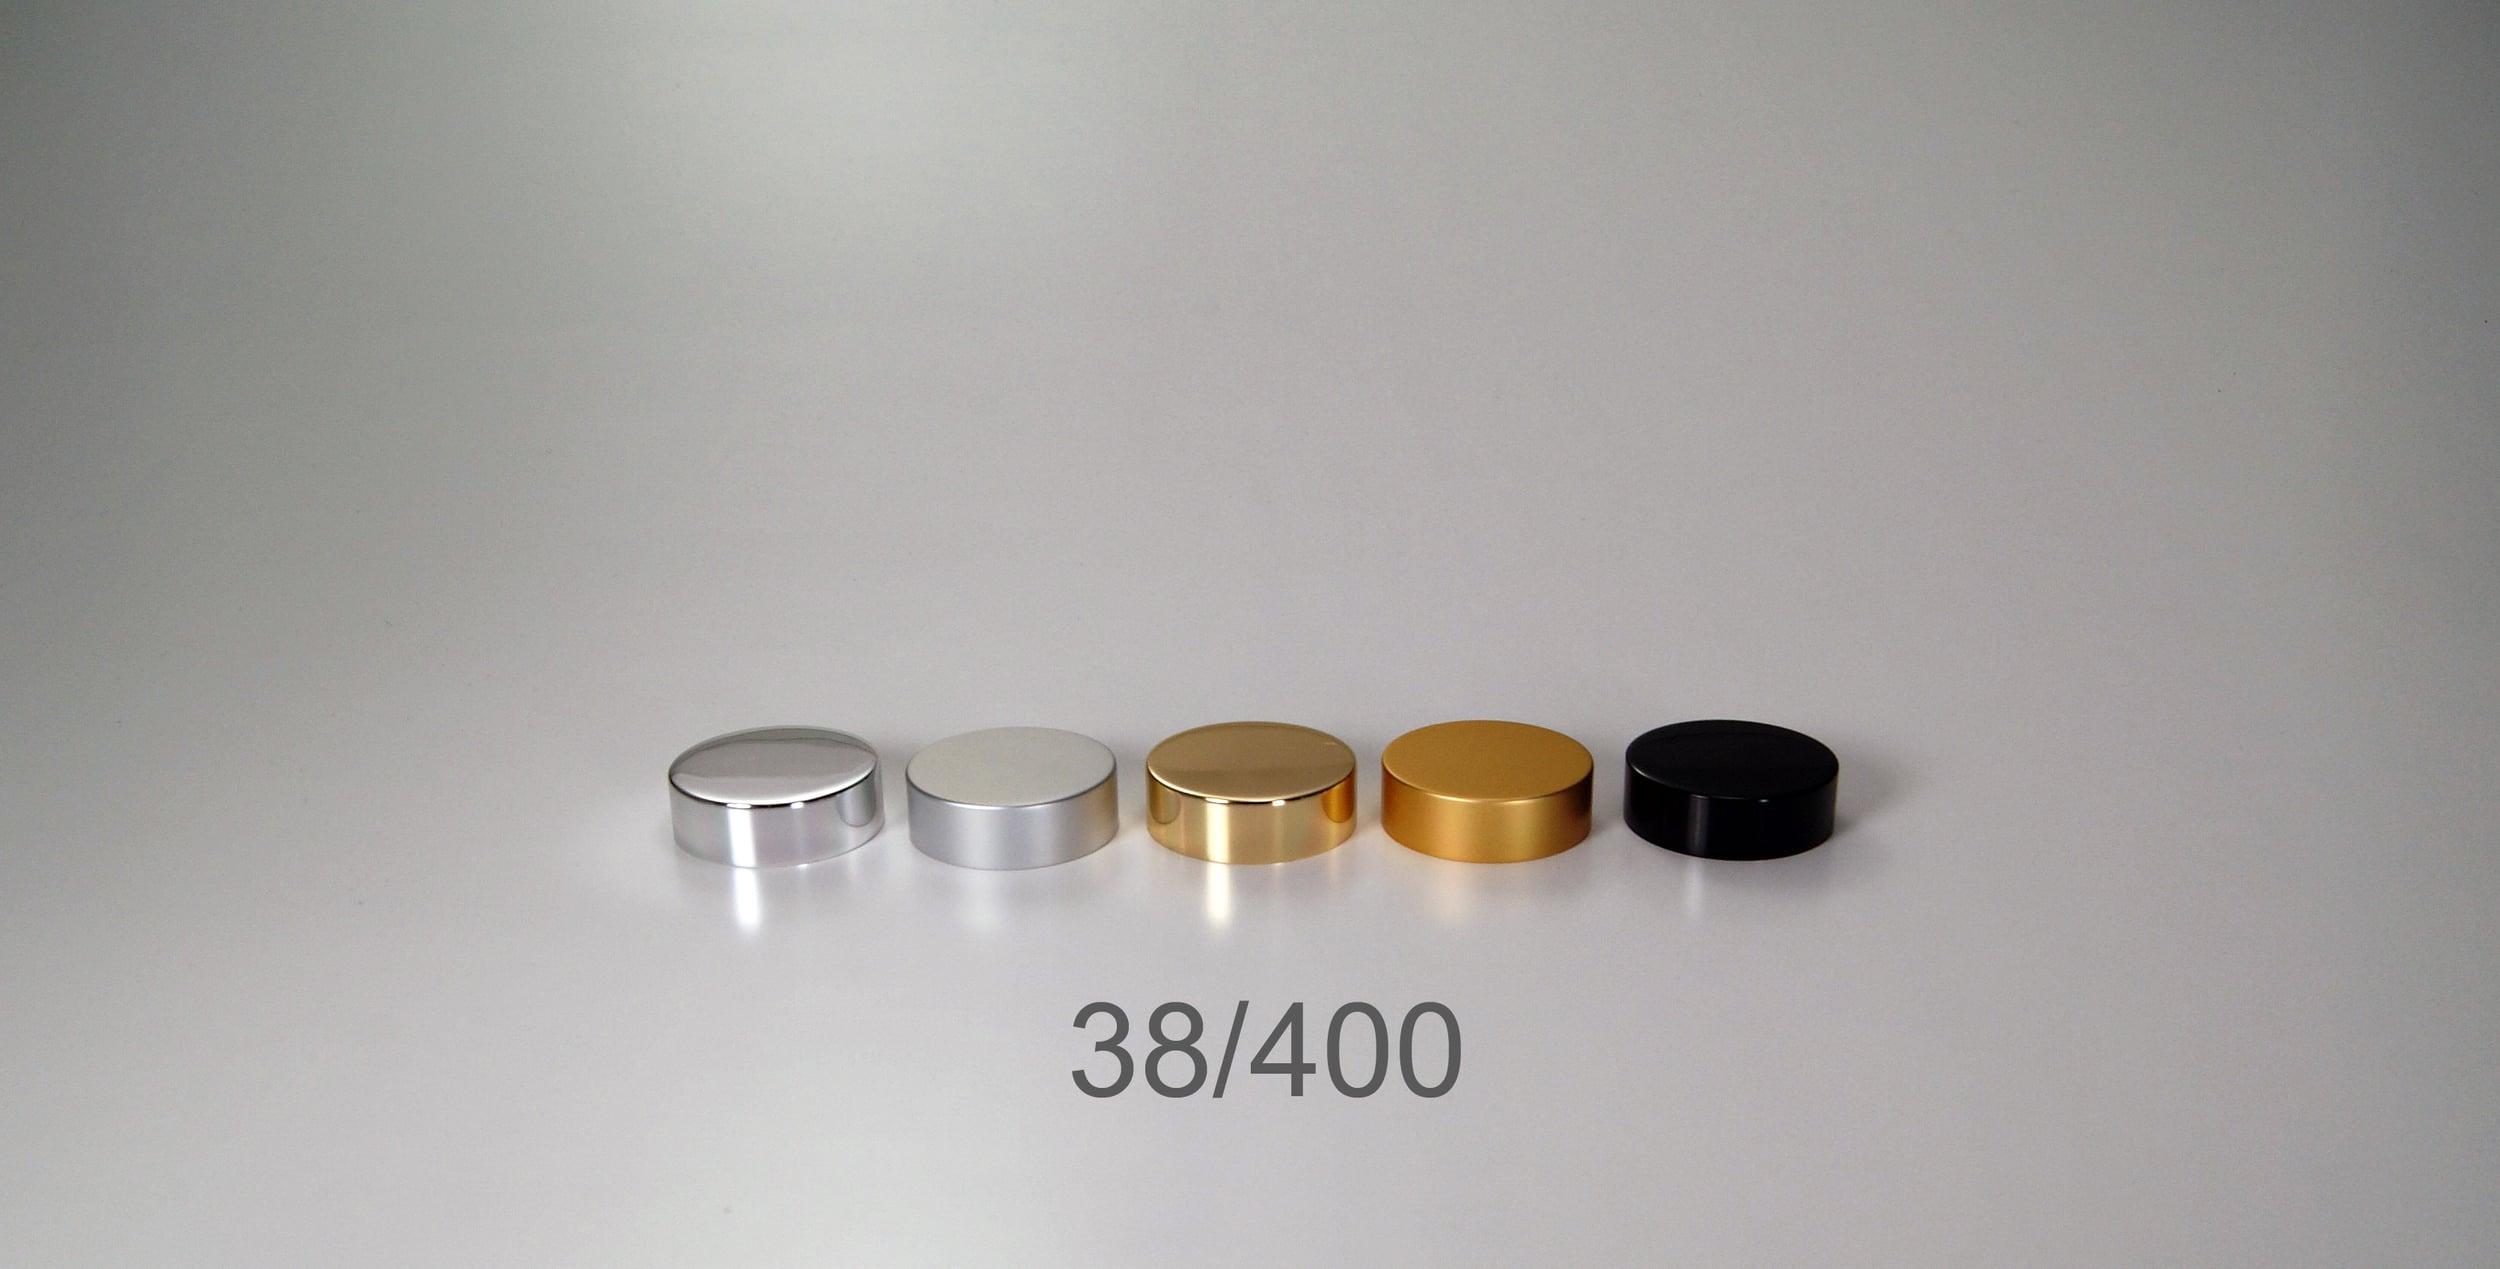 38-400 caps.jpg